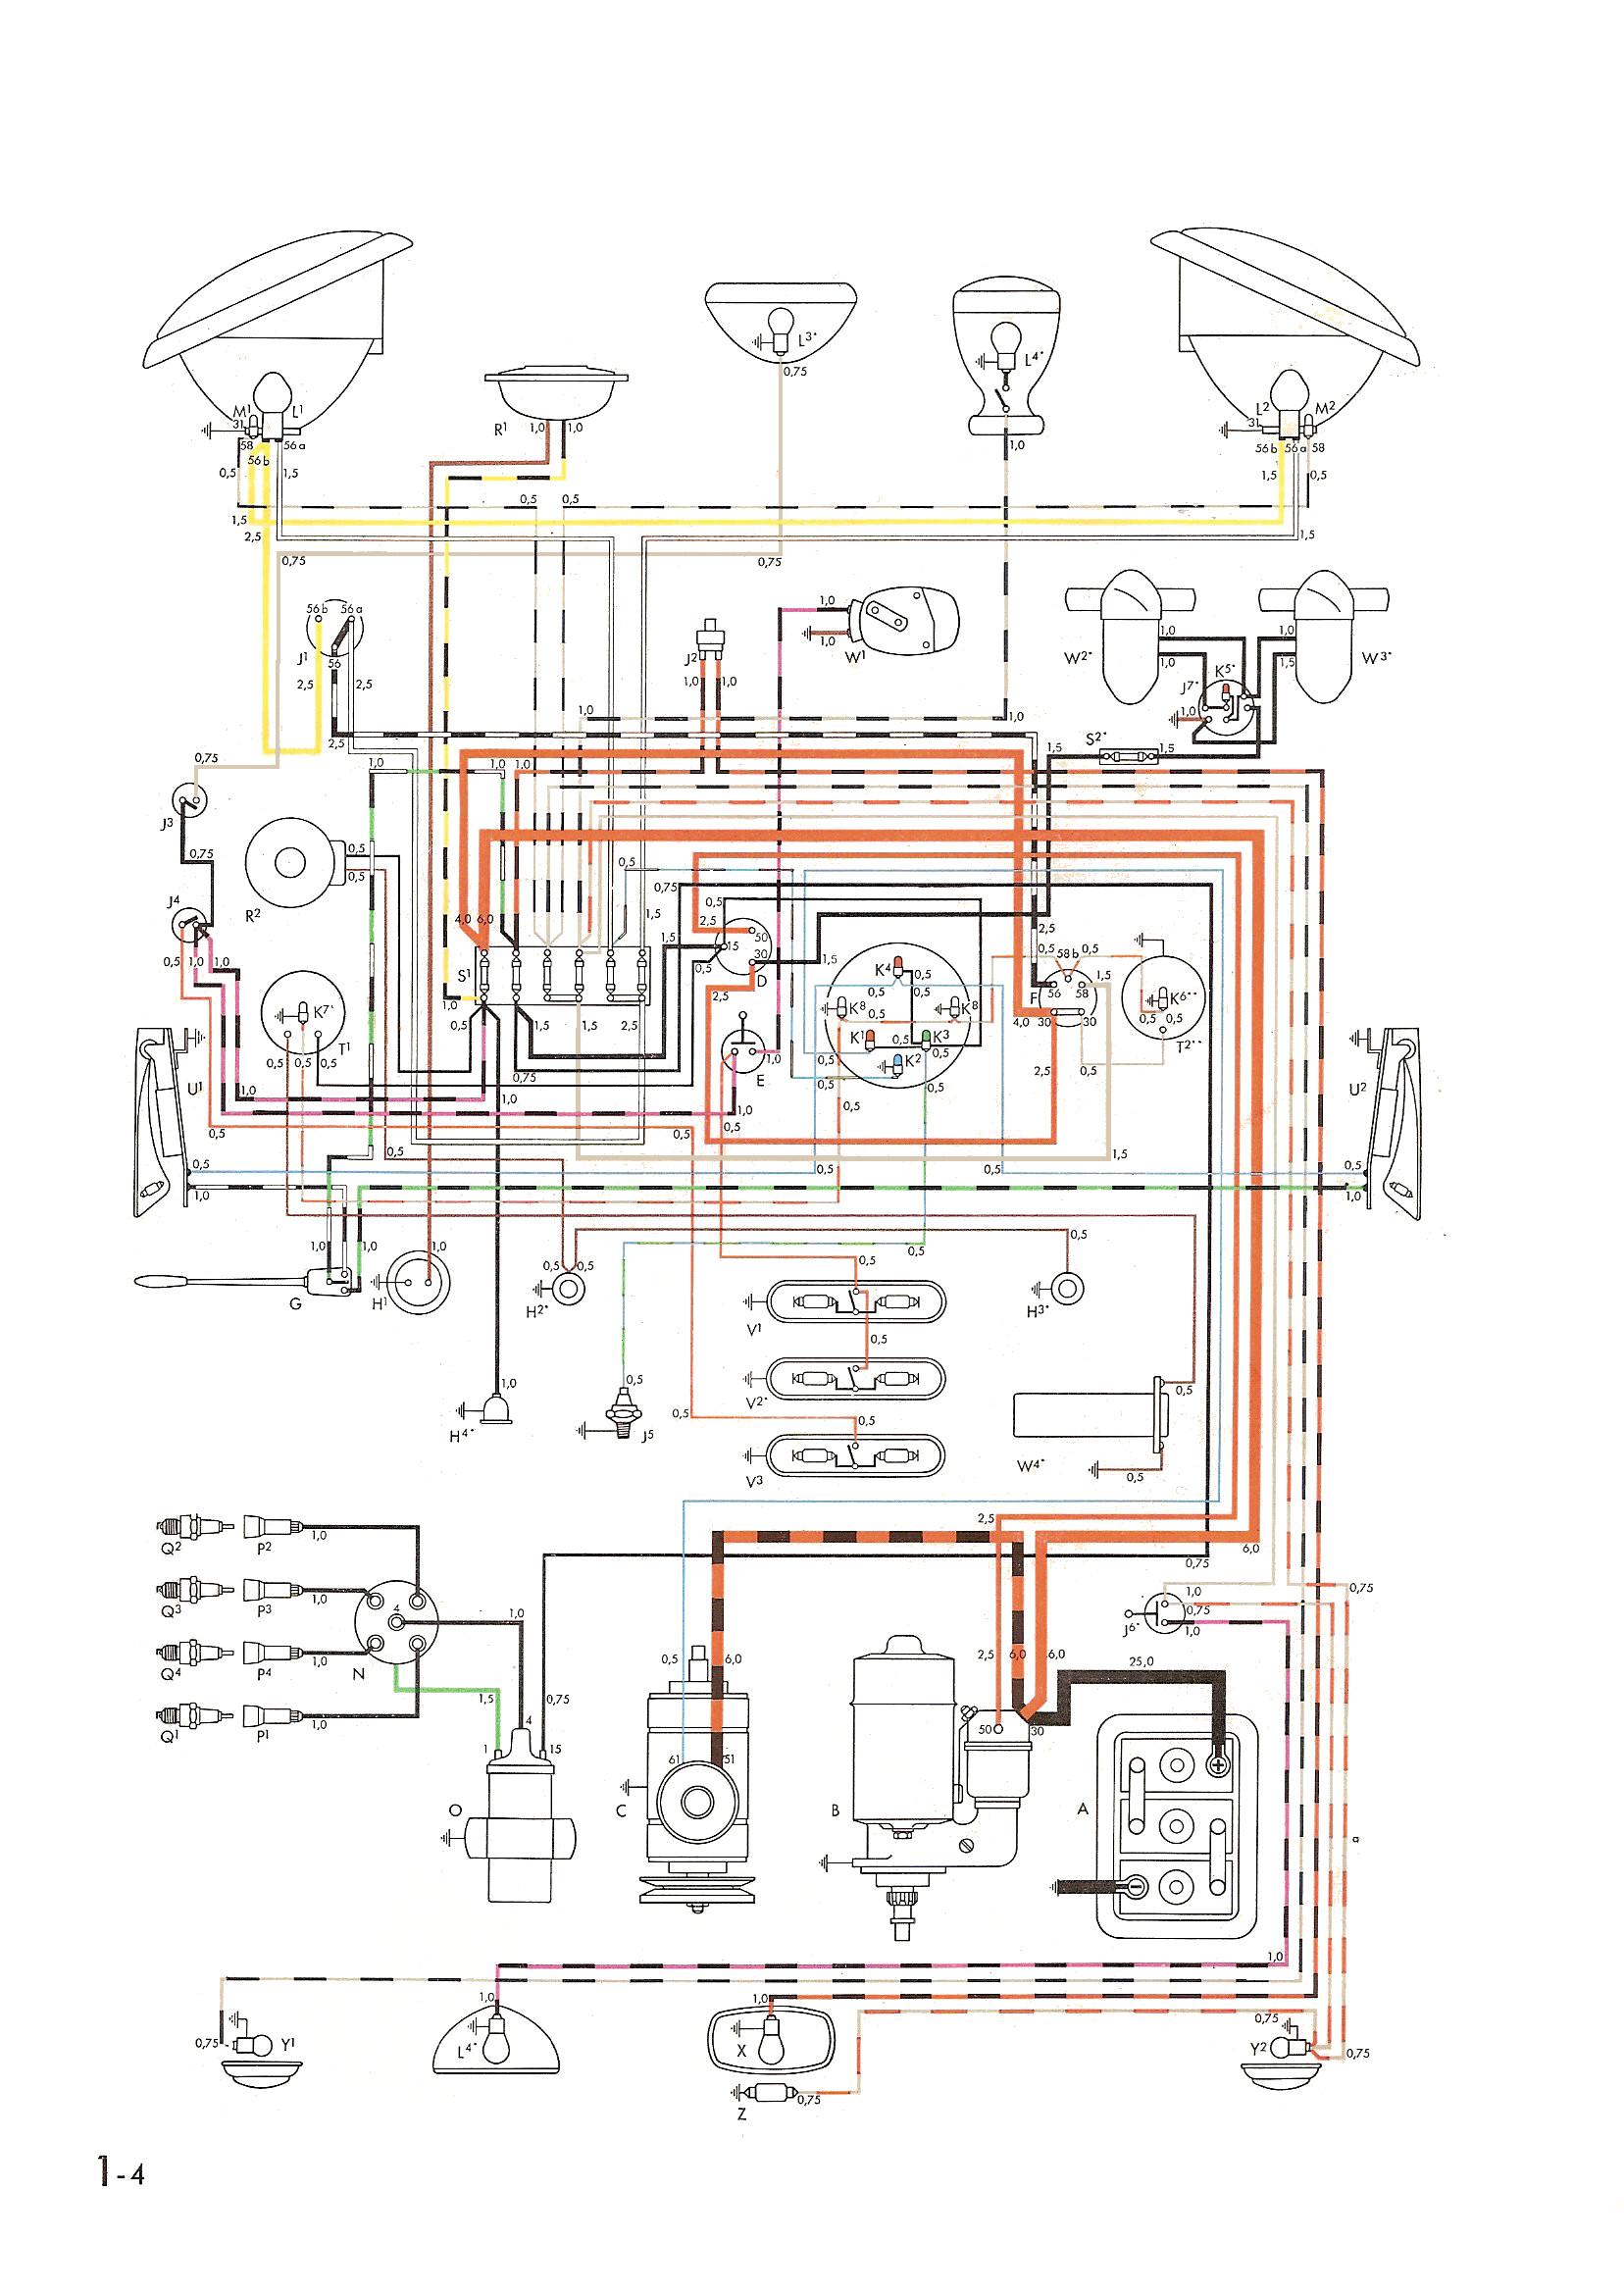 hight resolution of champion bus wiring diagram wiring diagram origin braun wiring diagram elkhart coach wiring diagram